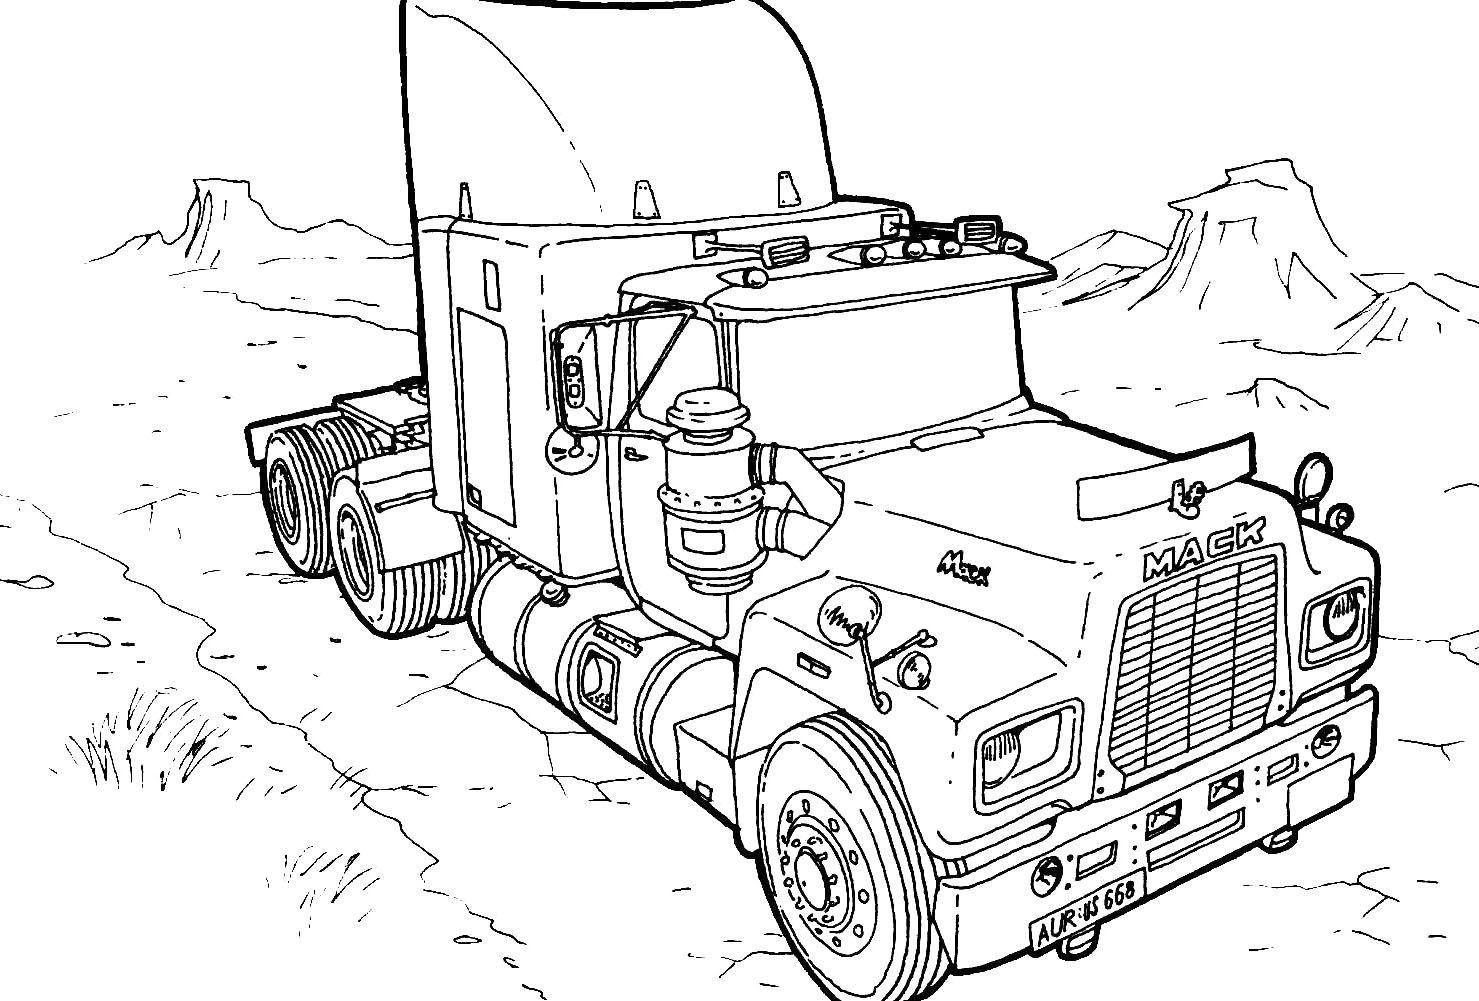 Big Mack Truck Coloring For Kids | MACK TOUGH | Monster truck ...